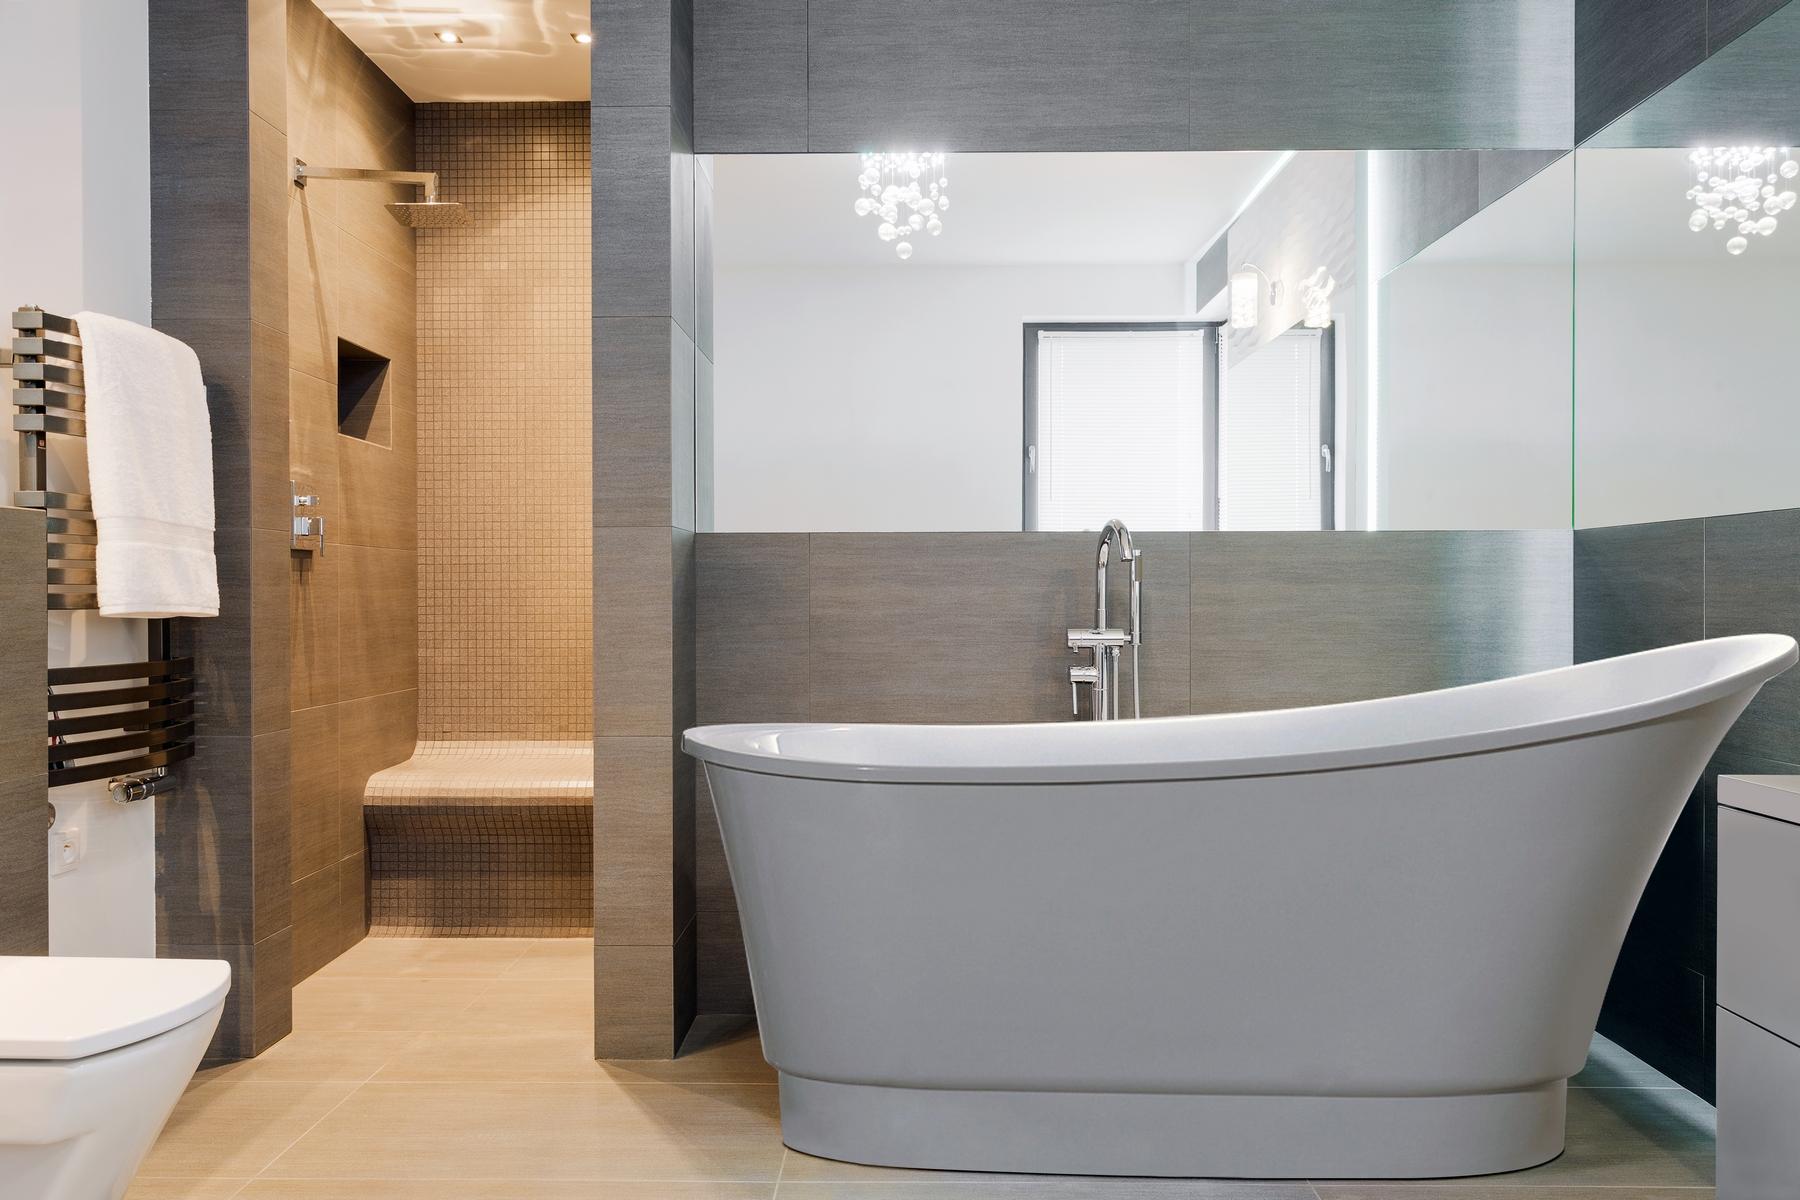 Freestanding Soaking Tub For Two | Home Decor & Renovation Ideas